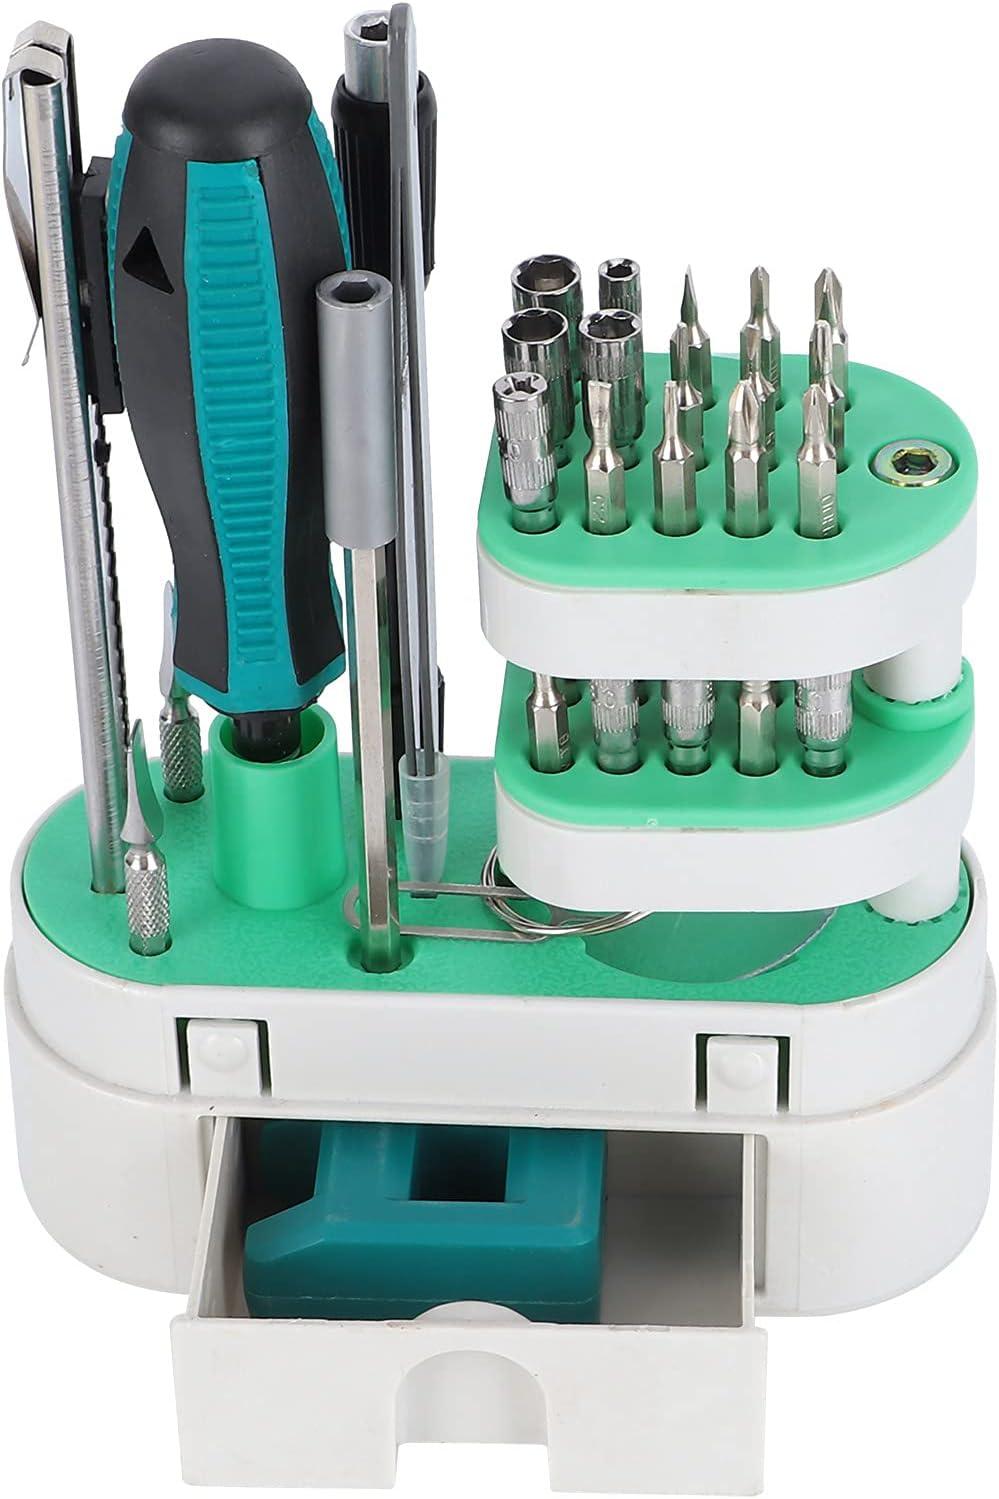 21809 Electronic Device Repair Limited time cheap sale Bit Screwdri Set Tools Multi-Bit High quality new